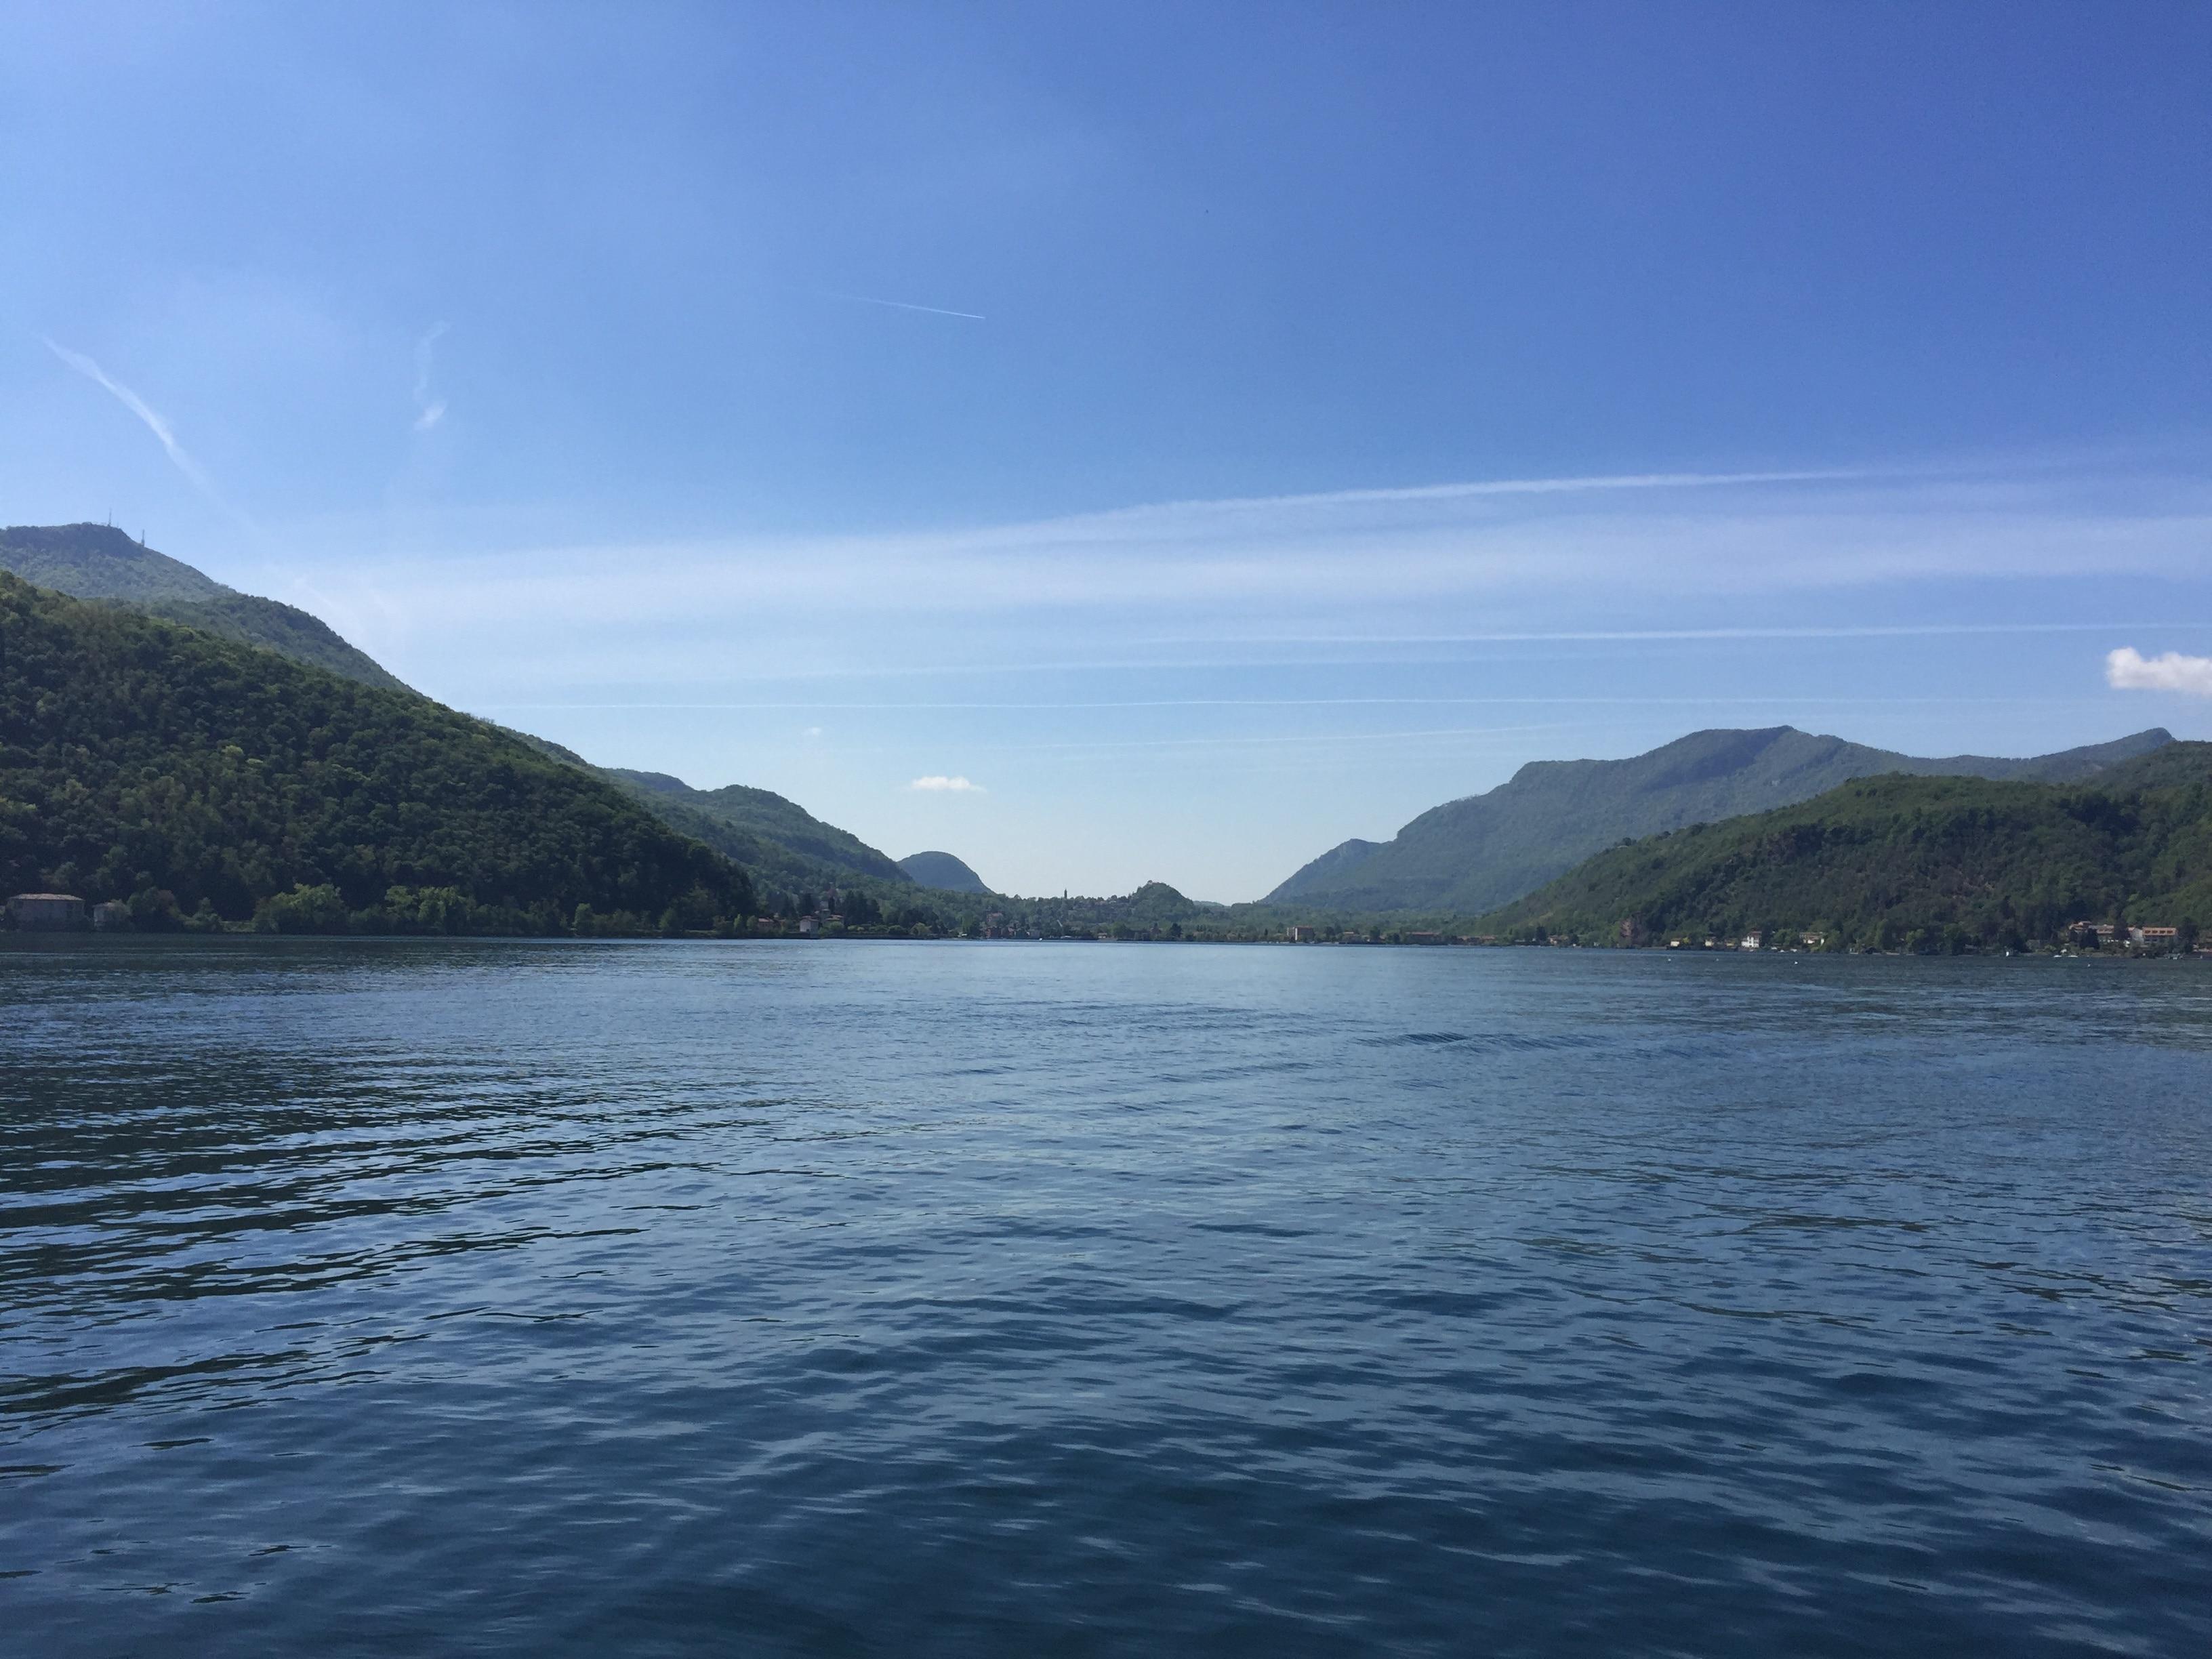 Morcote, Canton of Ticino, Switzerland